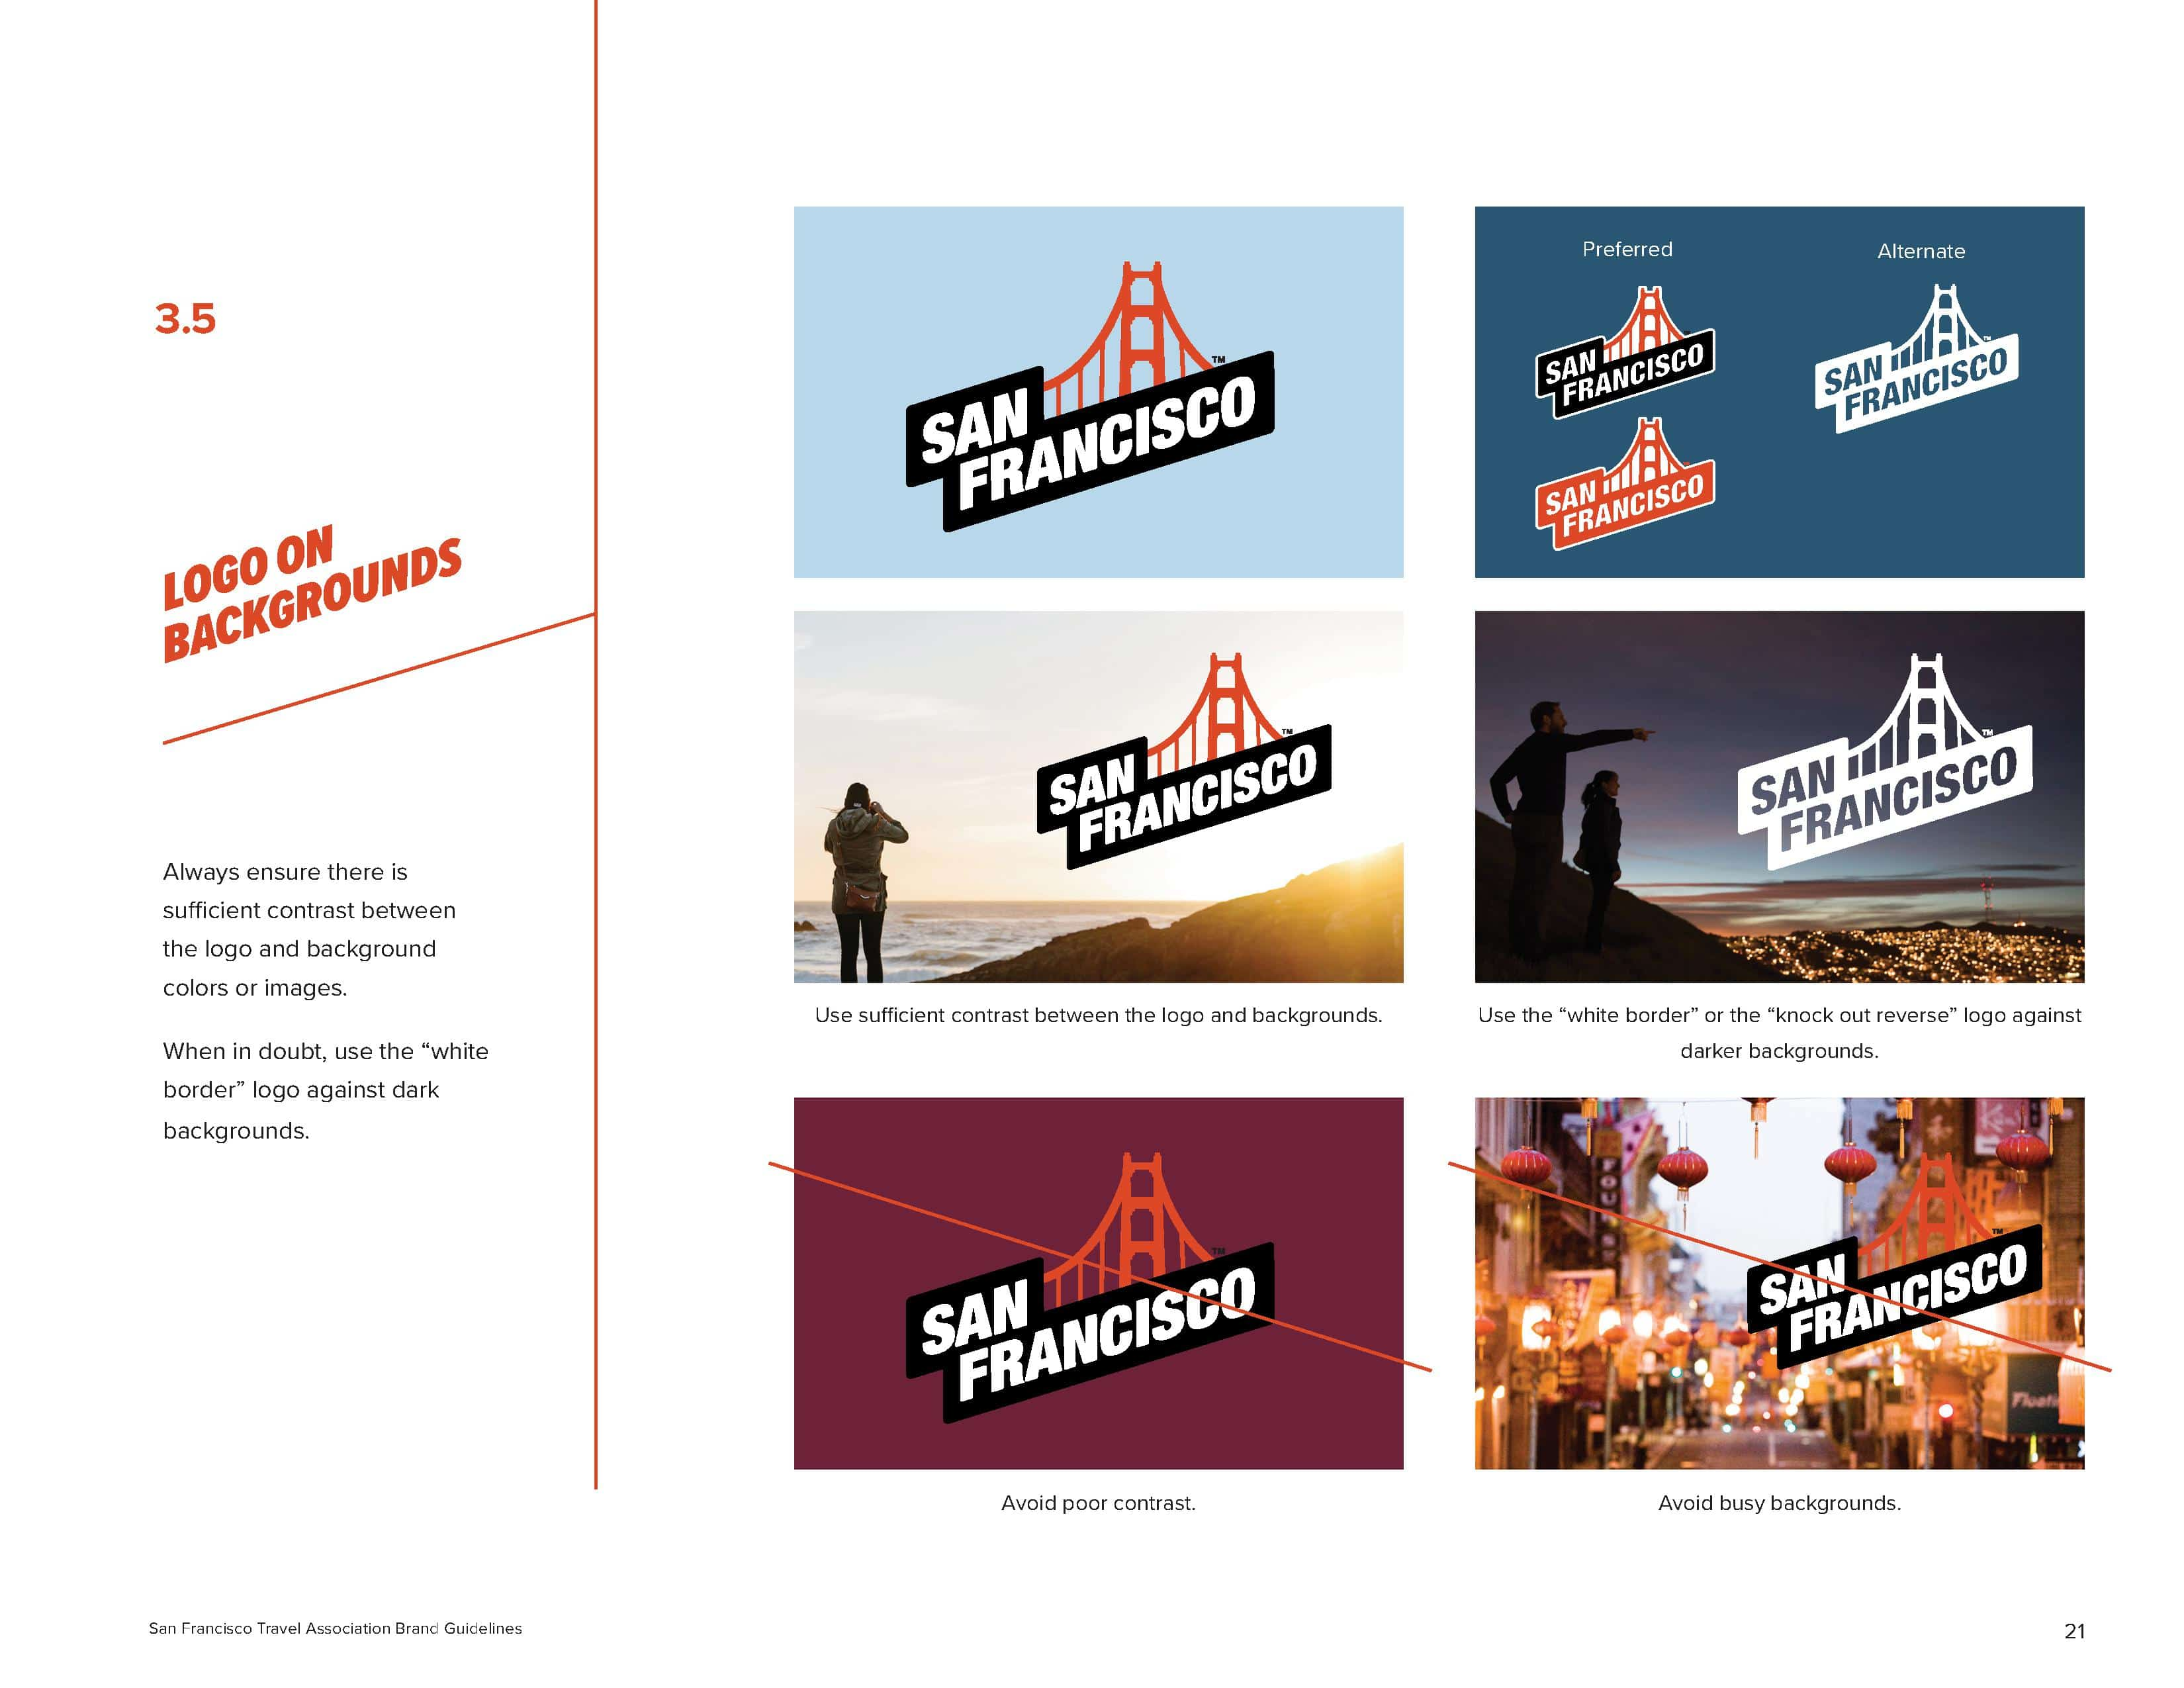 San Francisco Brand Book - Logo Placement